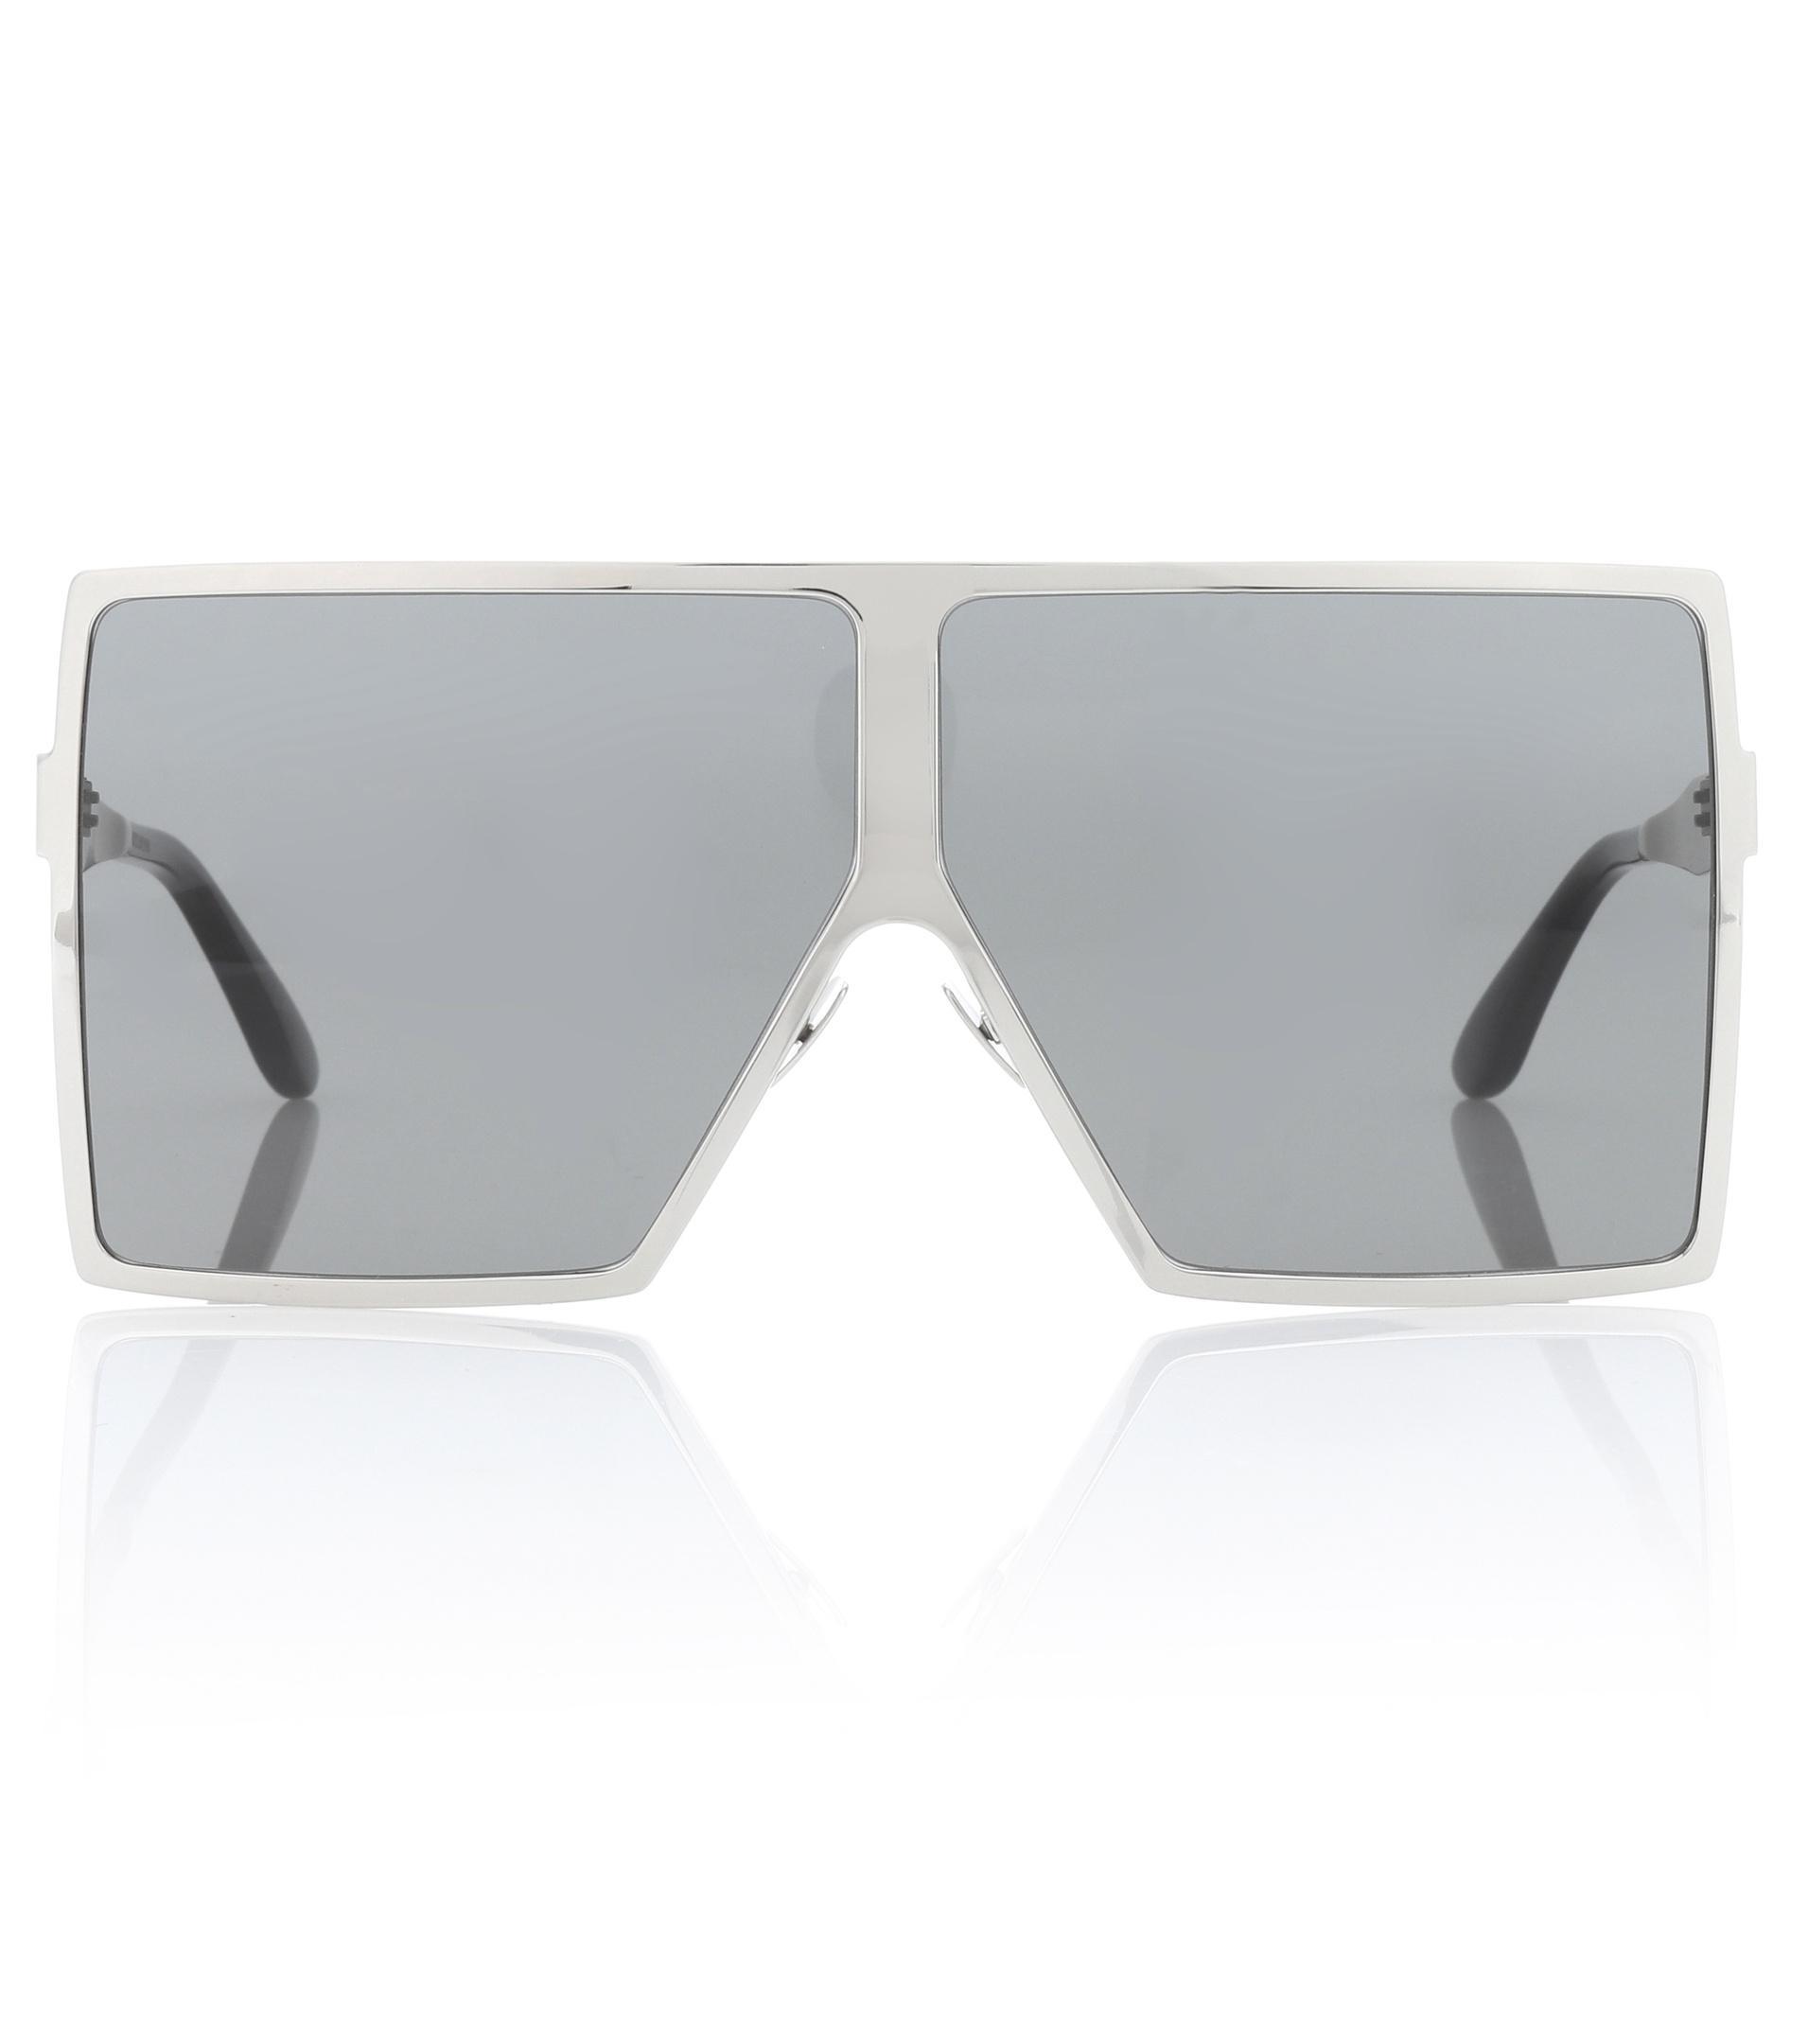 c1c7be4f4be Lyst - Saint Laurent New Wave 182 Betty Sunglasses in Metallic